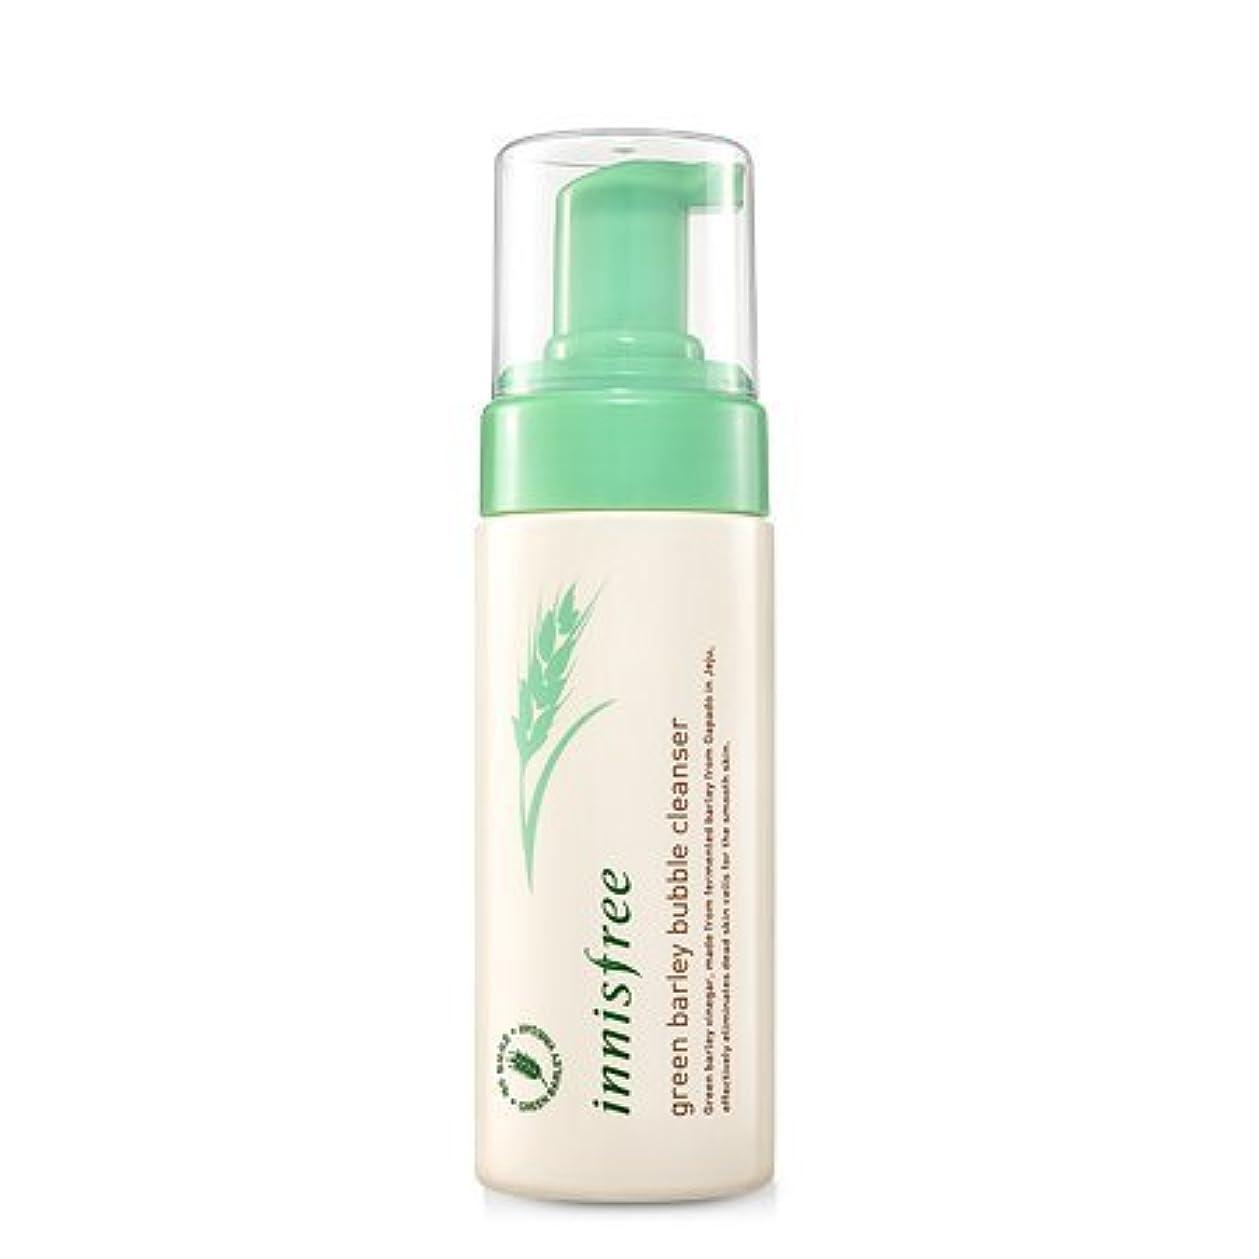 [innisfree(イニスフリー)] Green barley bubble cleanser 150ml 青麦のバブルクレンザー [並行輸入品][海外直送品]